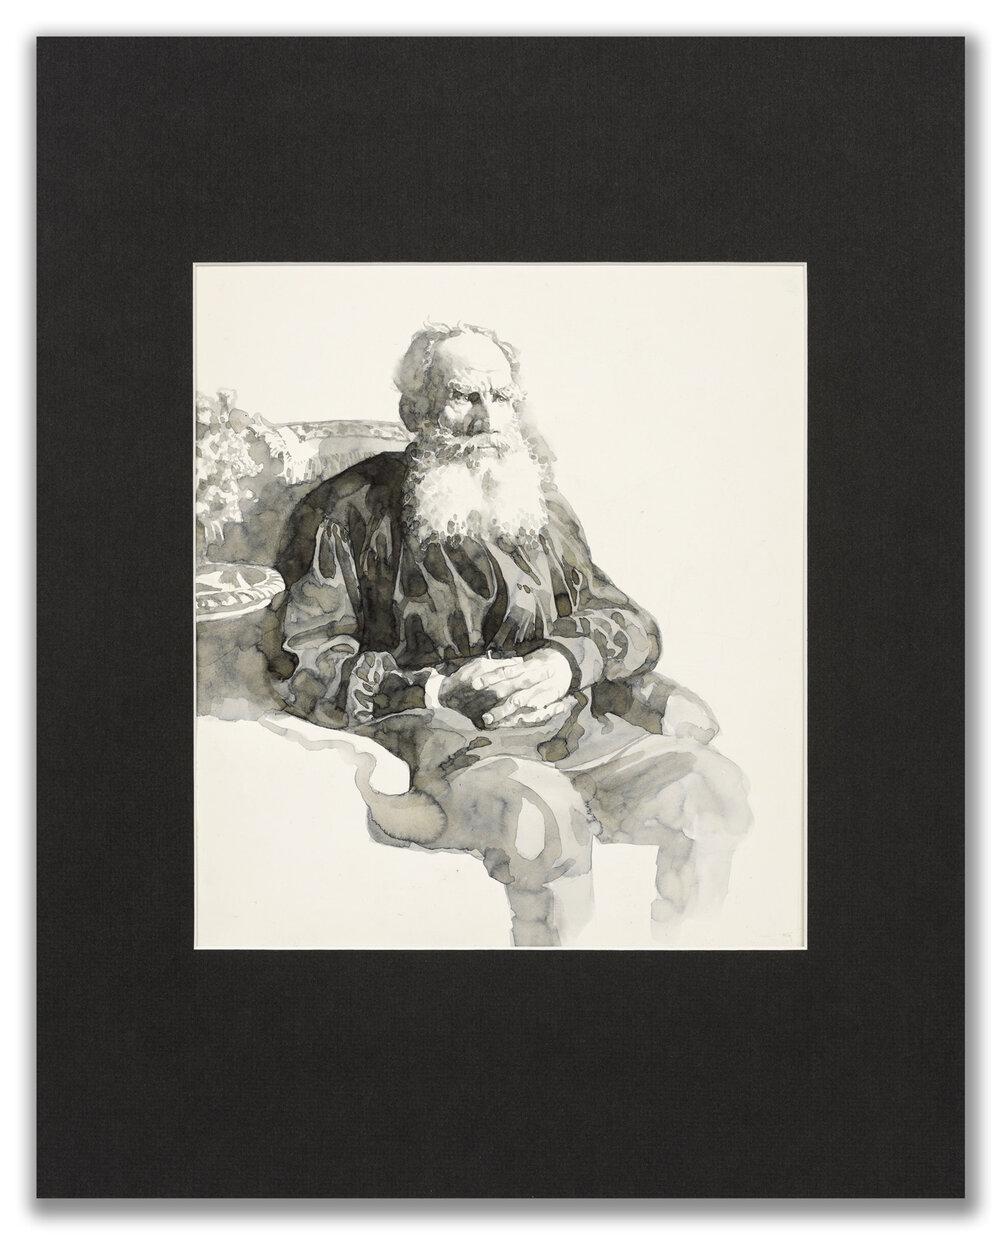 Michael Leonard, (British b.1933), A Good Age; Tolstoy, 1977.